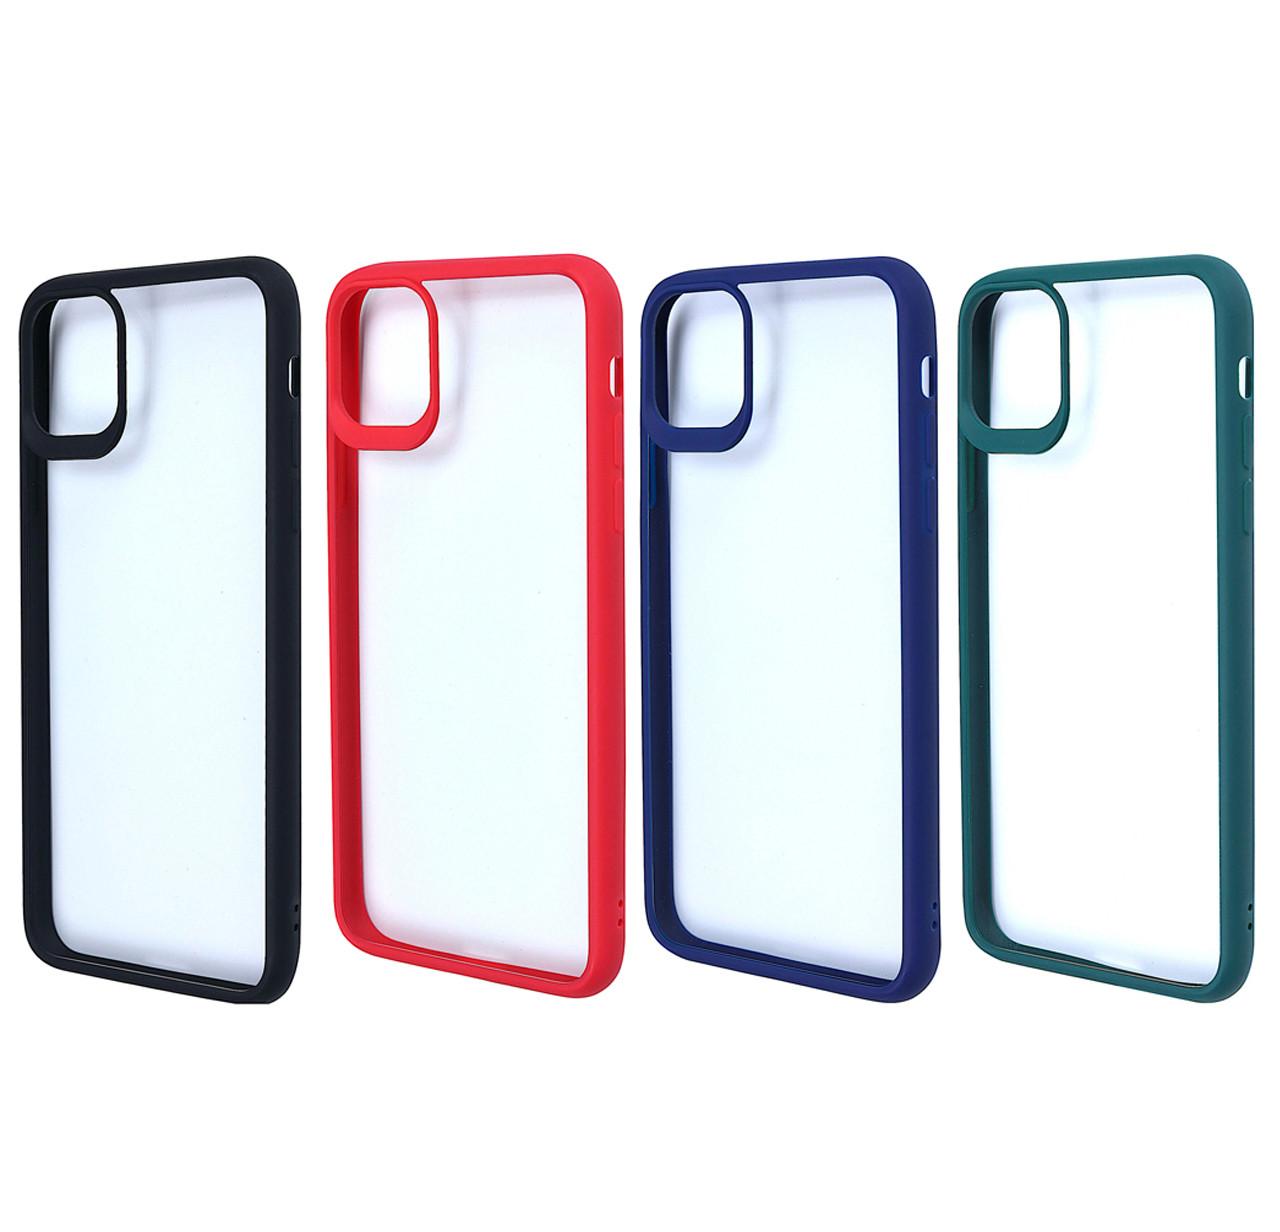 Чехол-накладка TPU+PC Colored Edge Case для IPhone 11 Pro